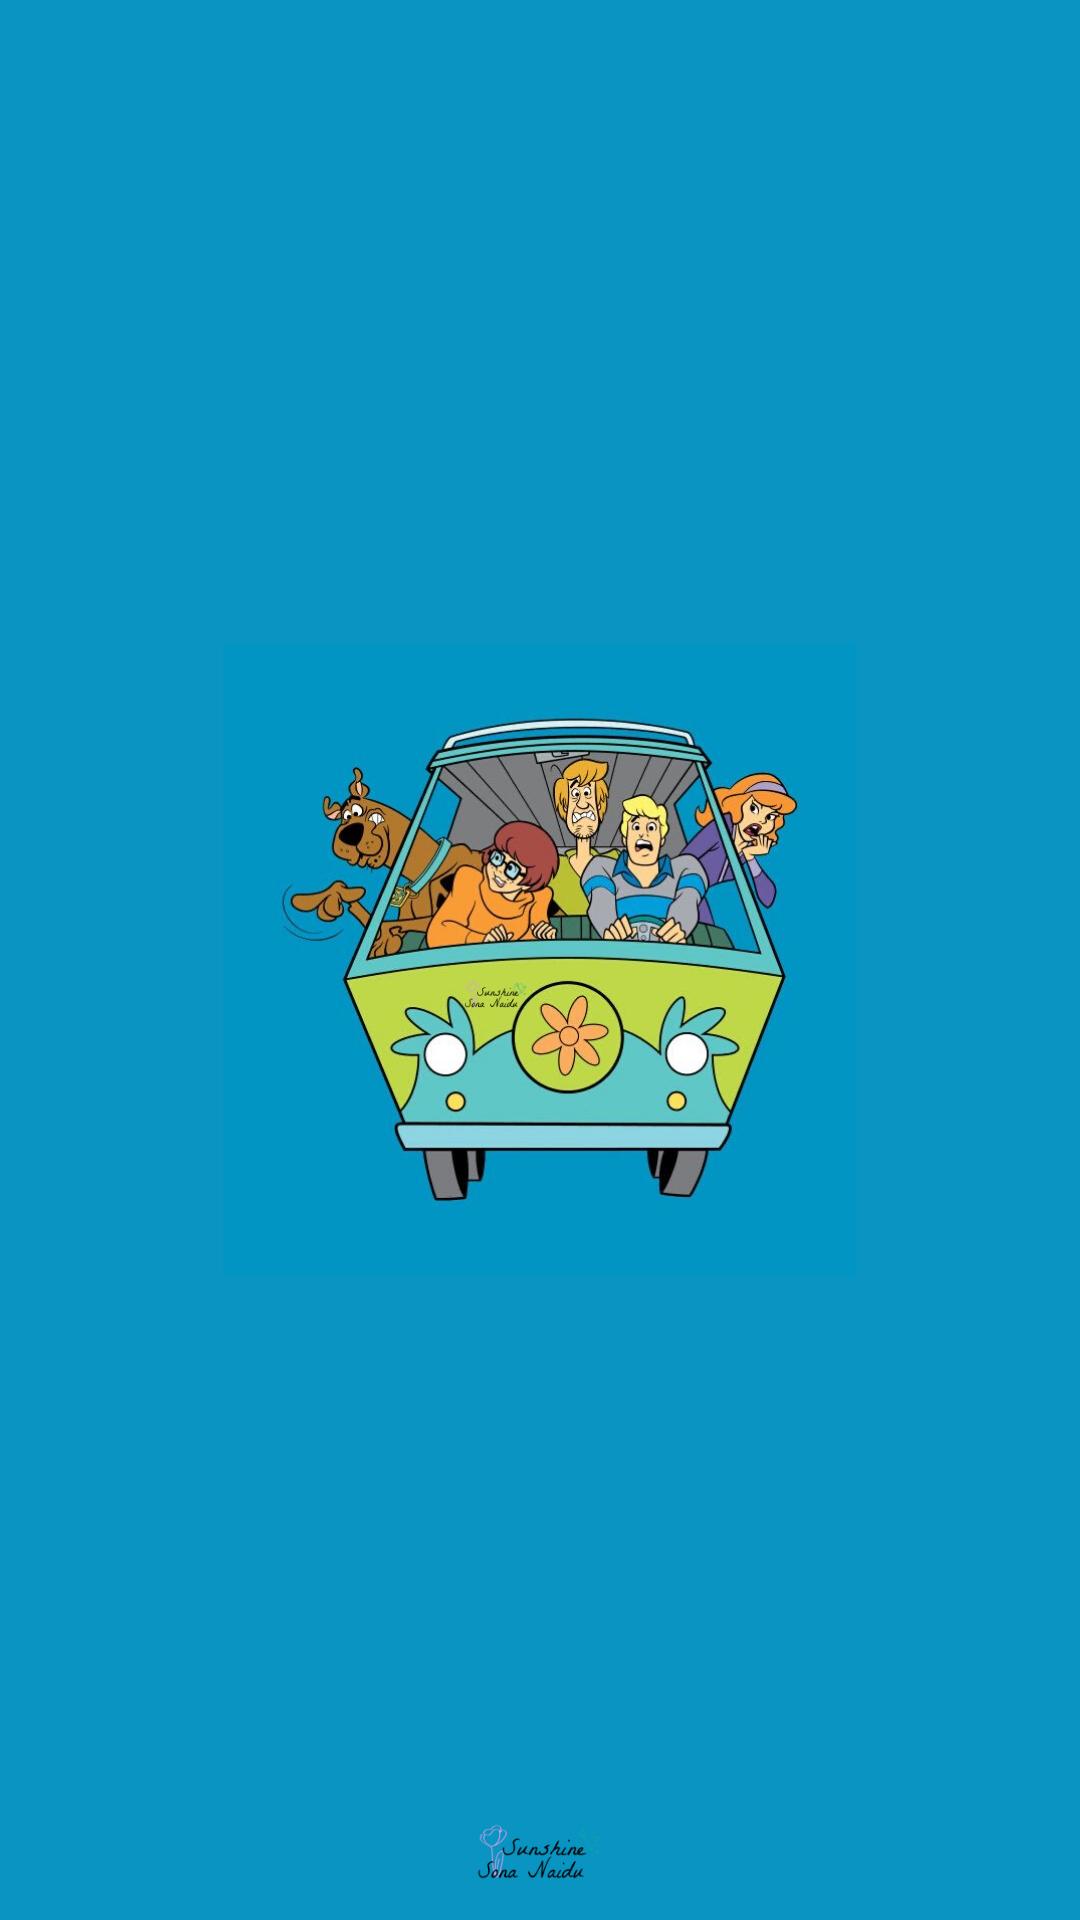 Scooby Doo Wallpaper Scooby Doo Images Scooby Doo Mystery Incorporated Cartoon Wallpaper Iphone